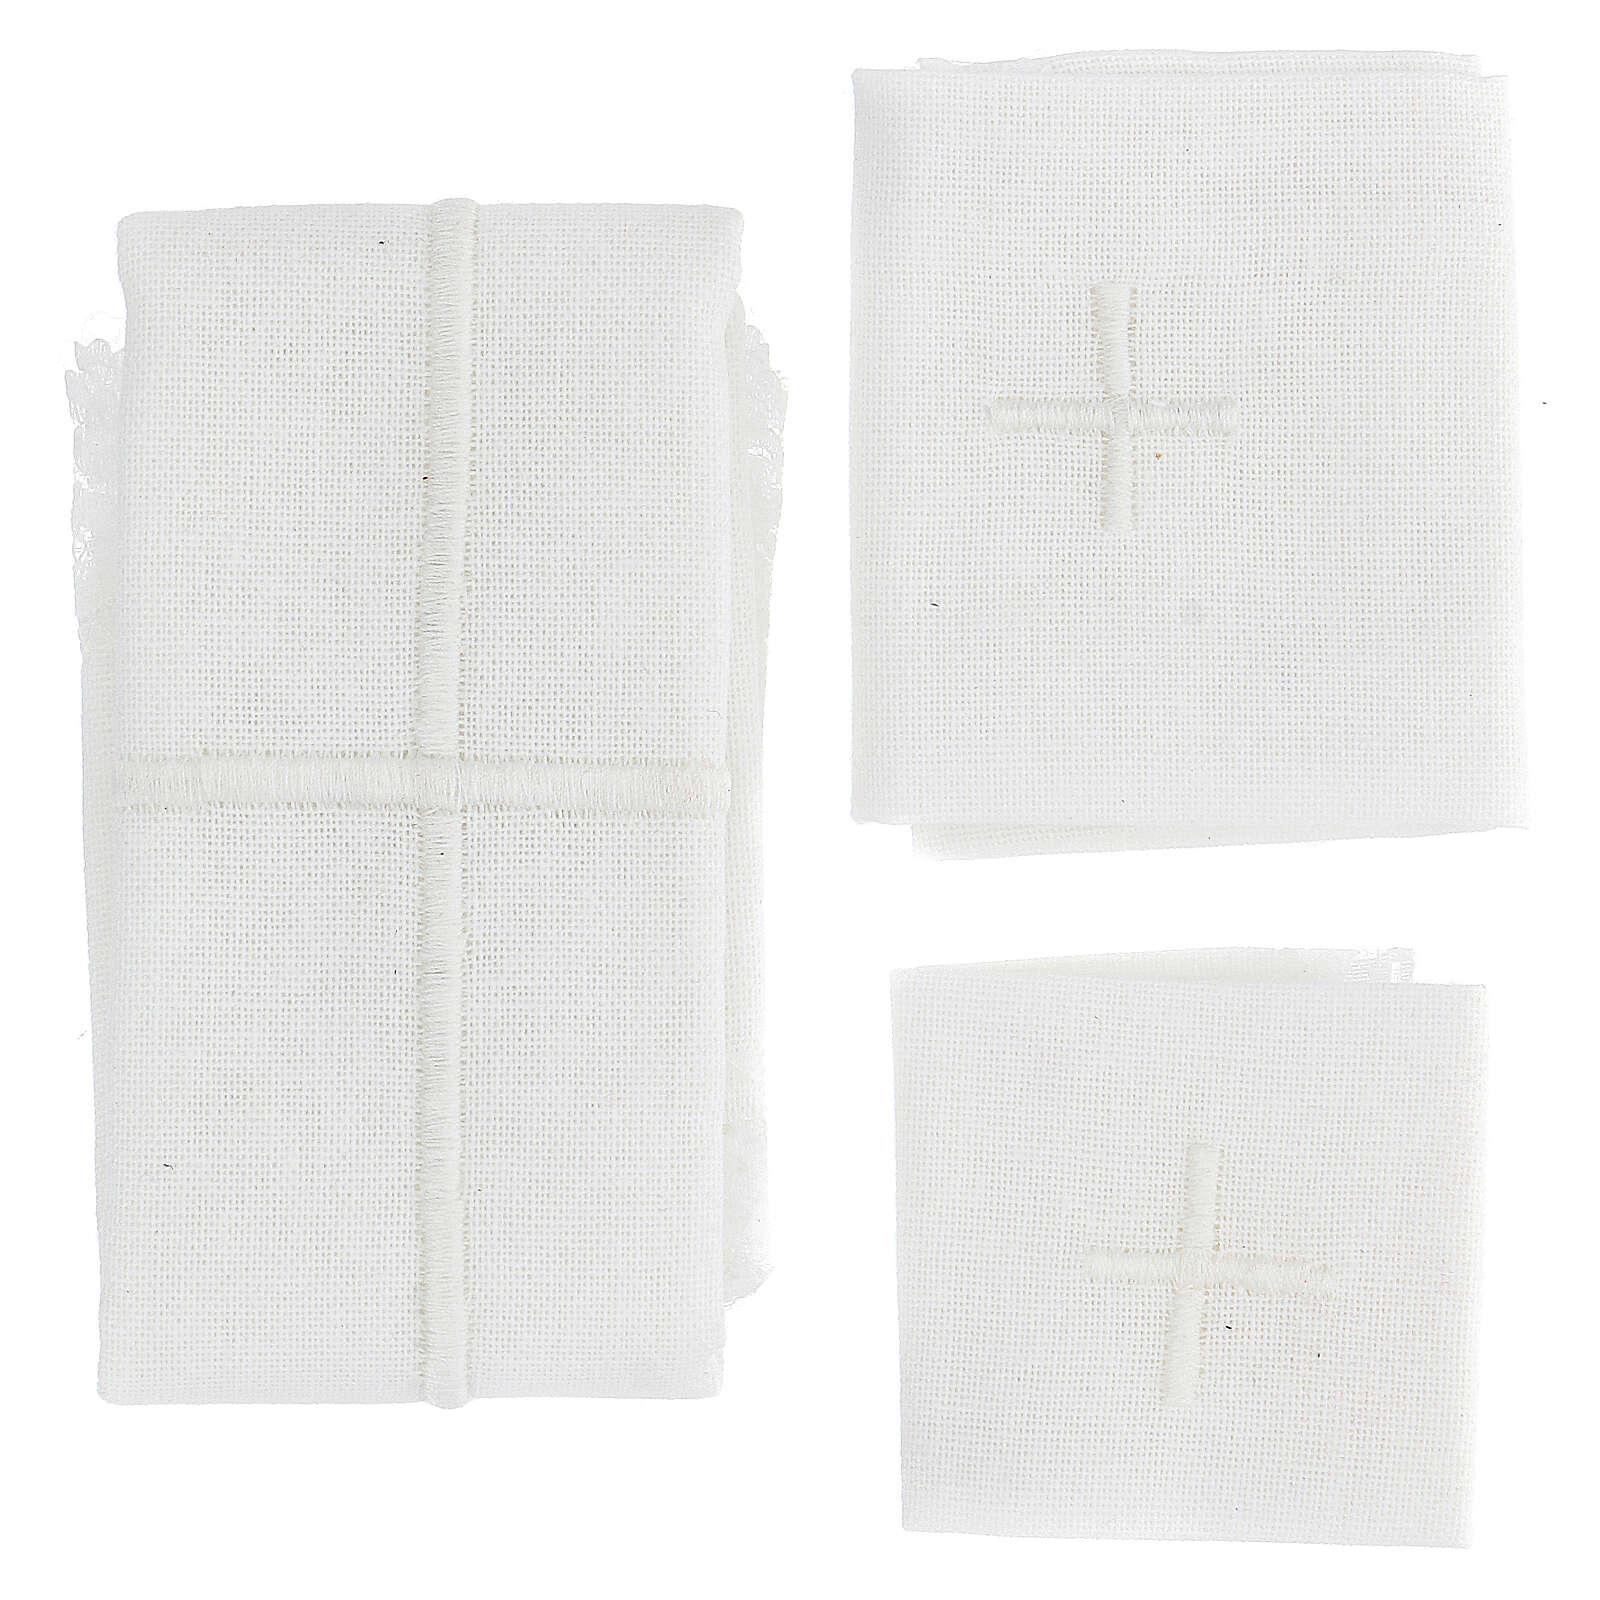 Mass kit soft leather bag 3